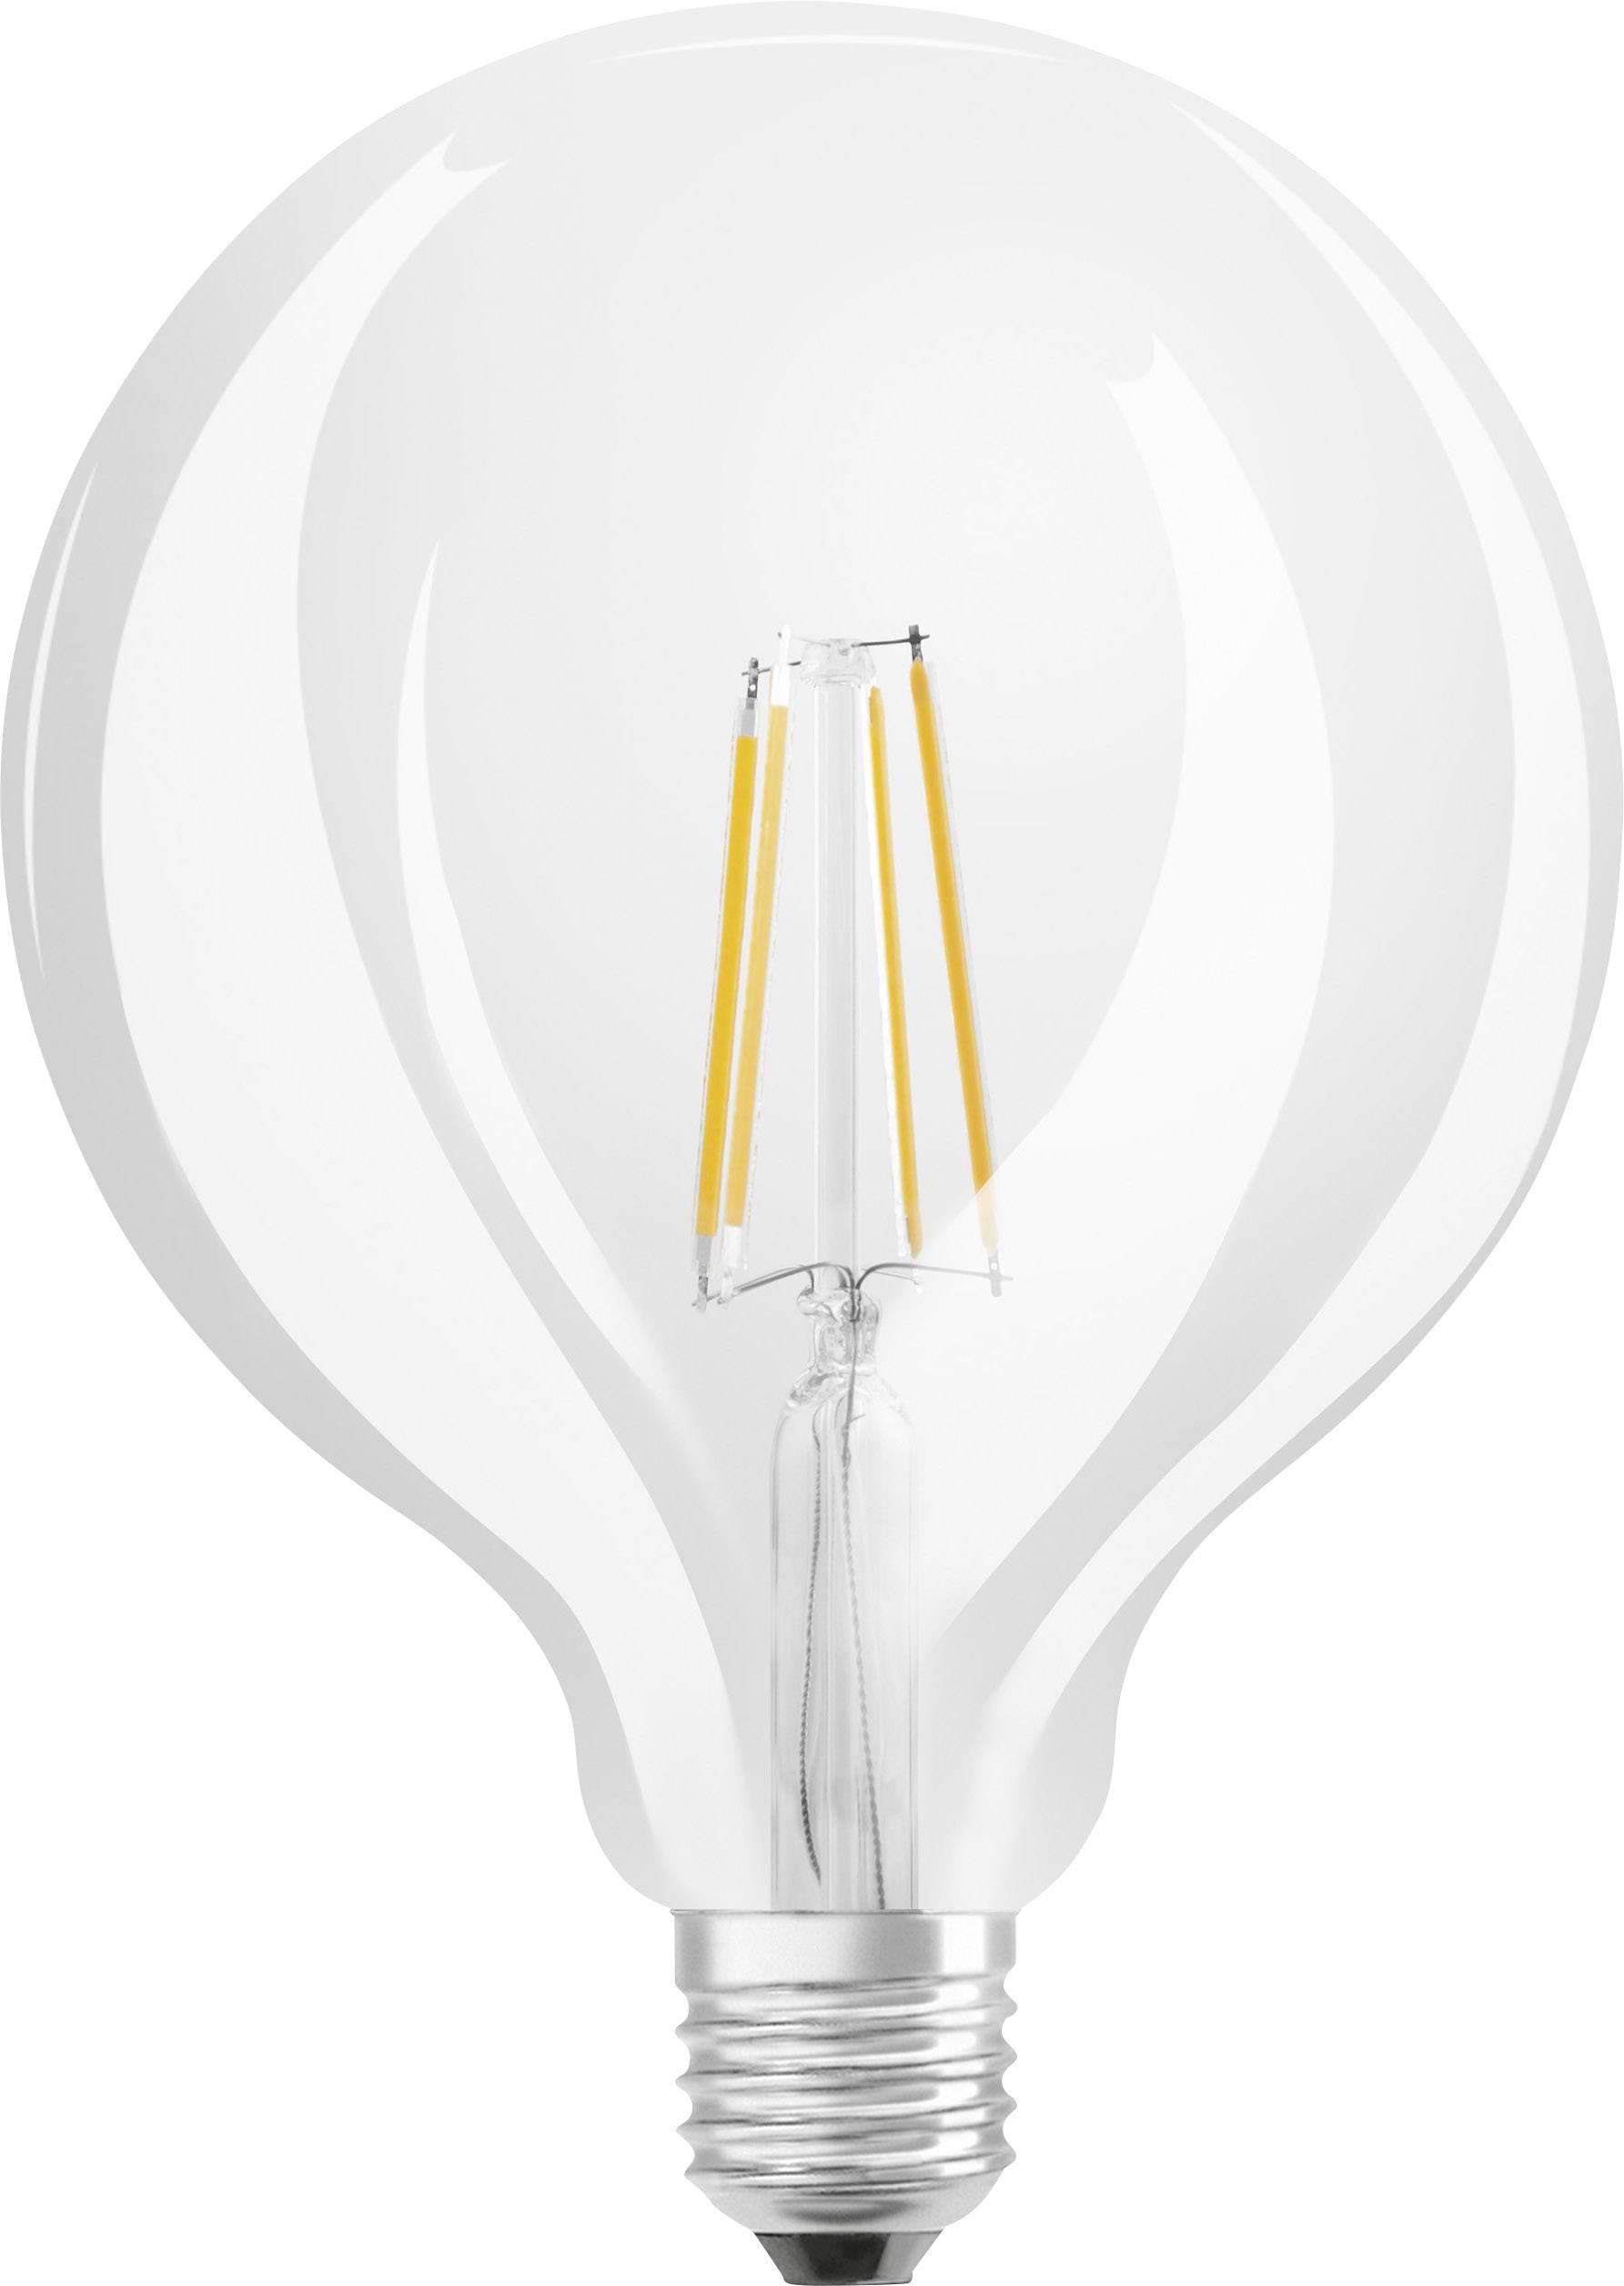 OSRAM LED-lamp E27 Bol 7 W = 60 W Warmwit Energielabel: A++ Dimbaar ...